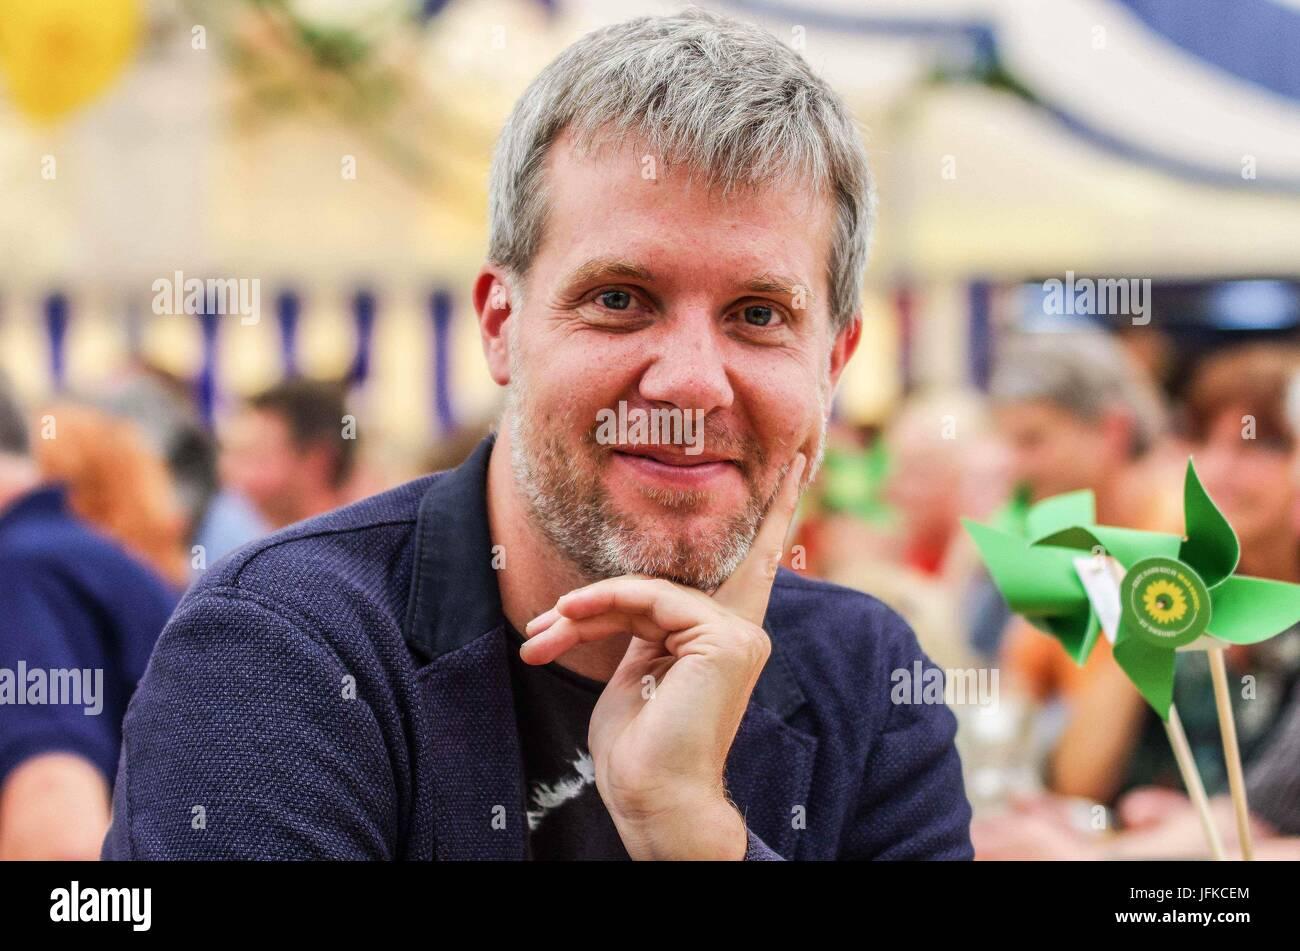 Tutzing, Bayern, Germany. 1st July, 2017. Dieter Janacek of the Bavarian Greens and Bundestag representative. Green Stock Photo